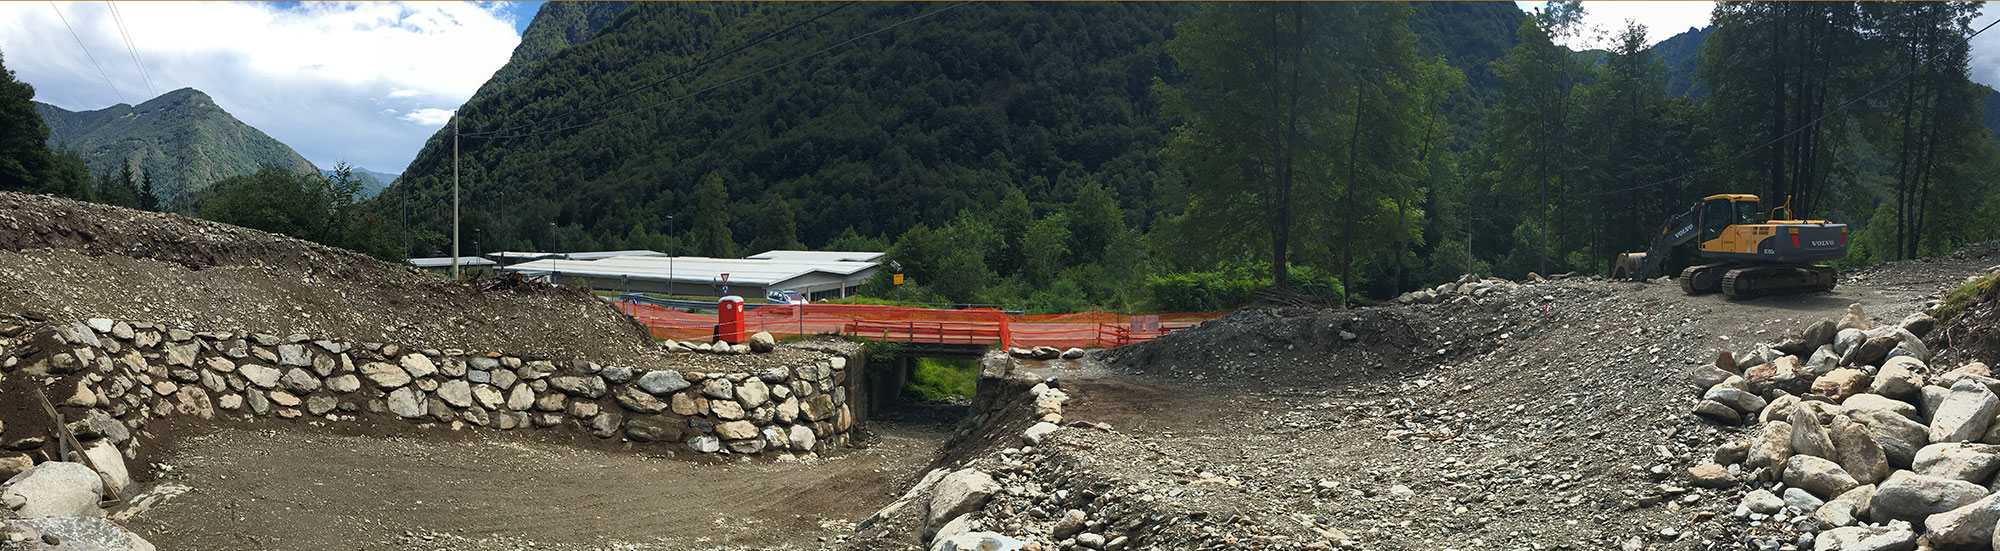 impresa defabiani costruzioni demolizioni scavi